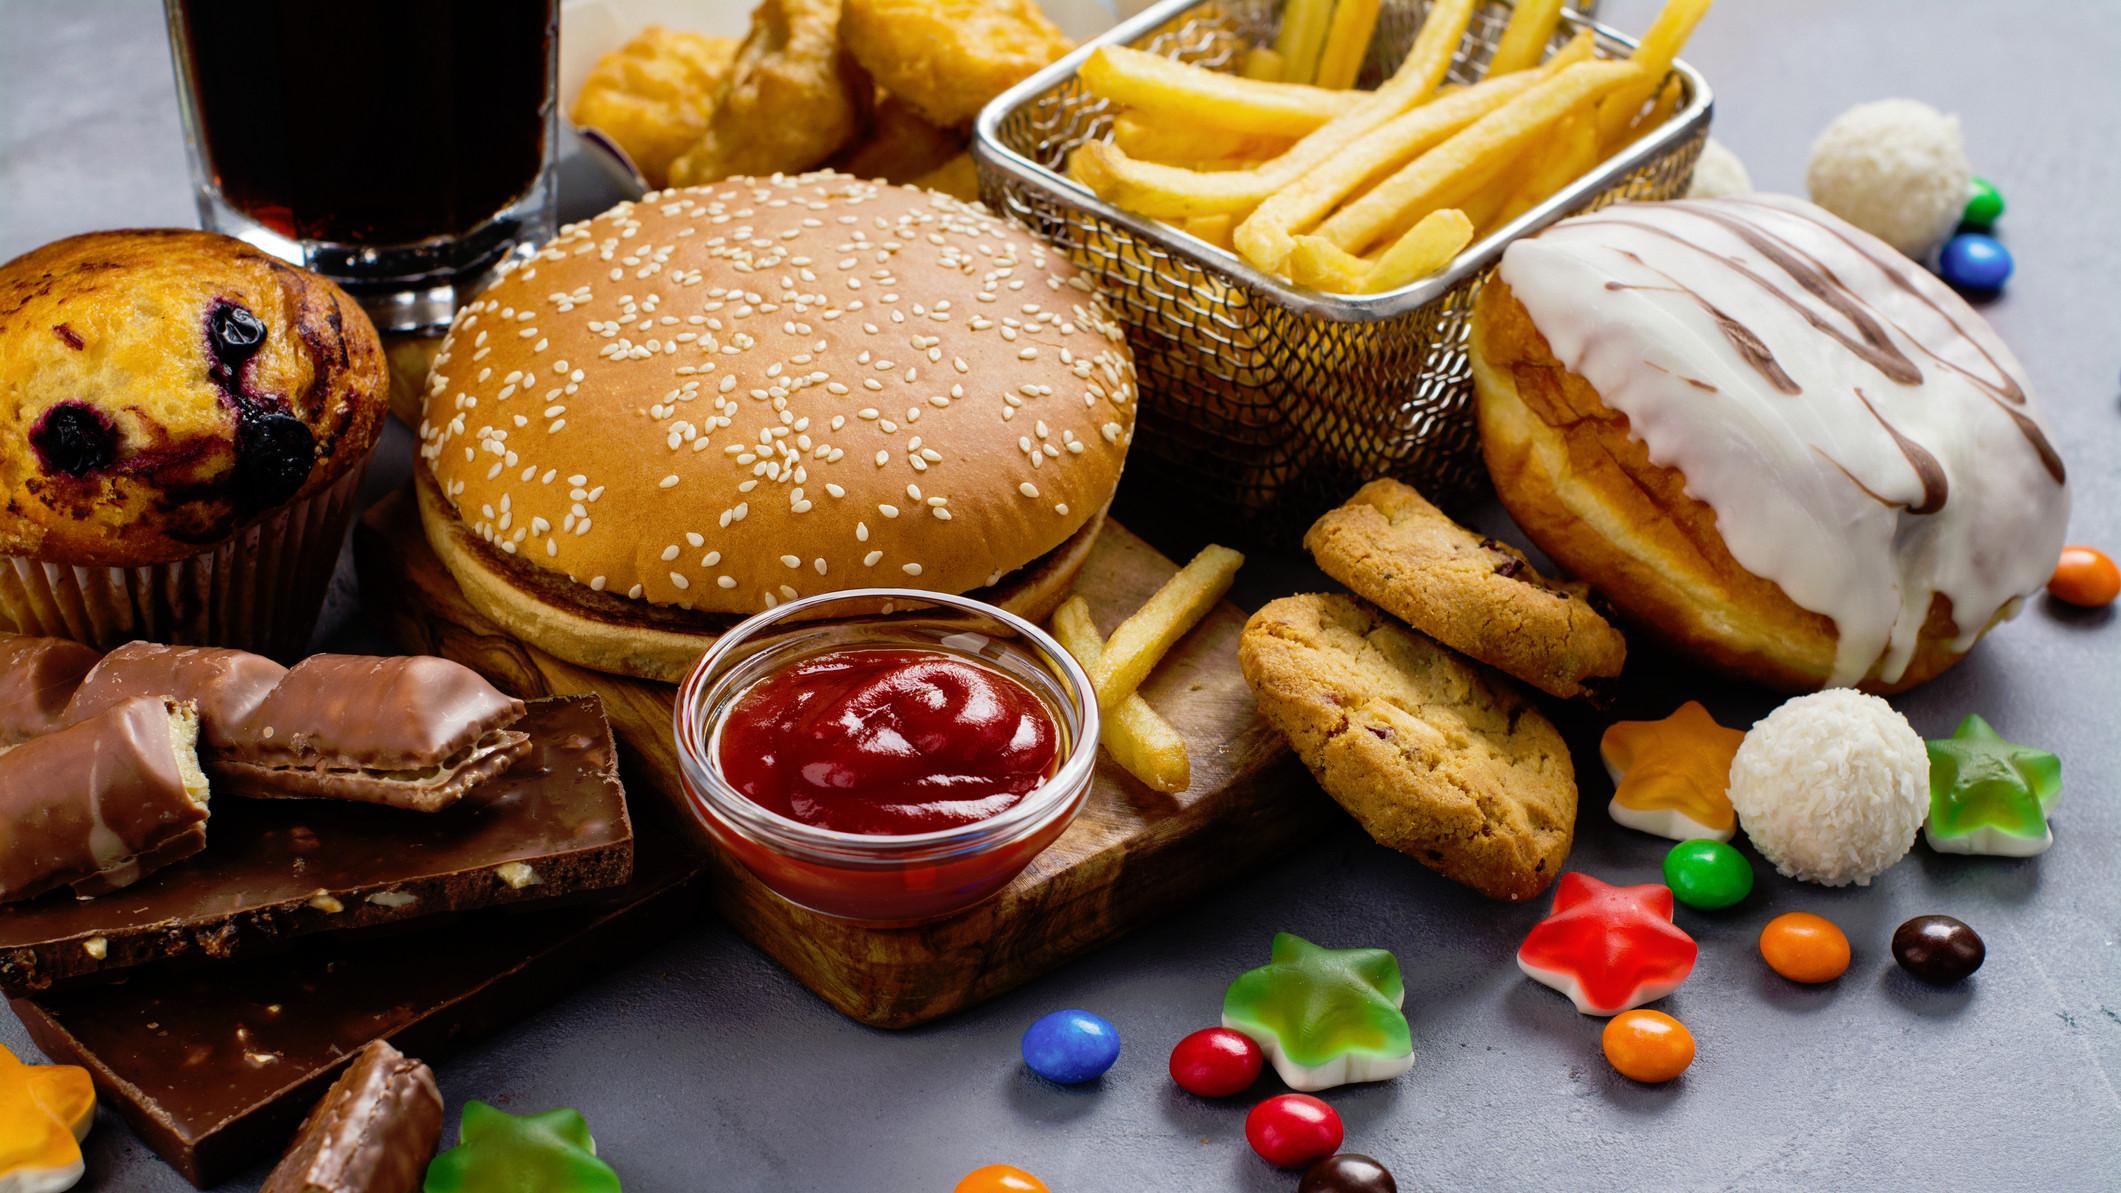 dieta poco saludable causa diabetes tipo 2